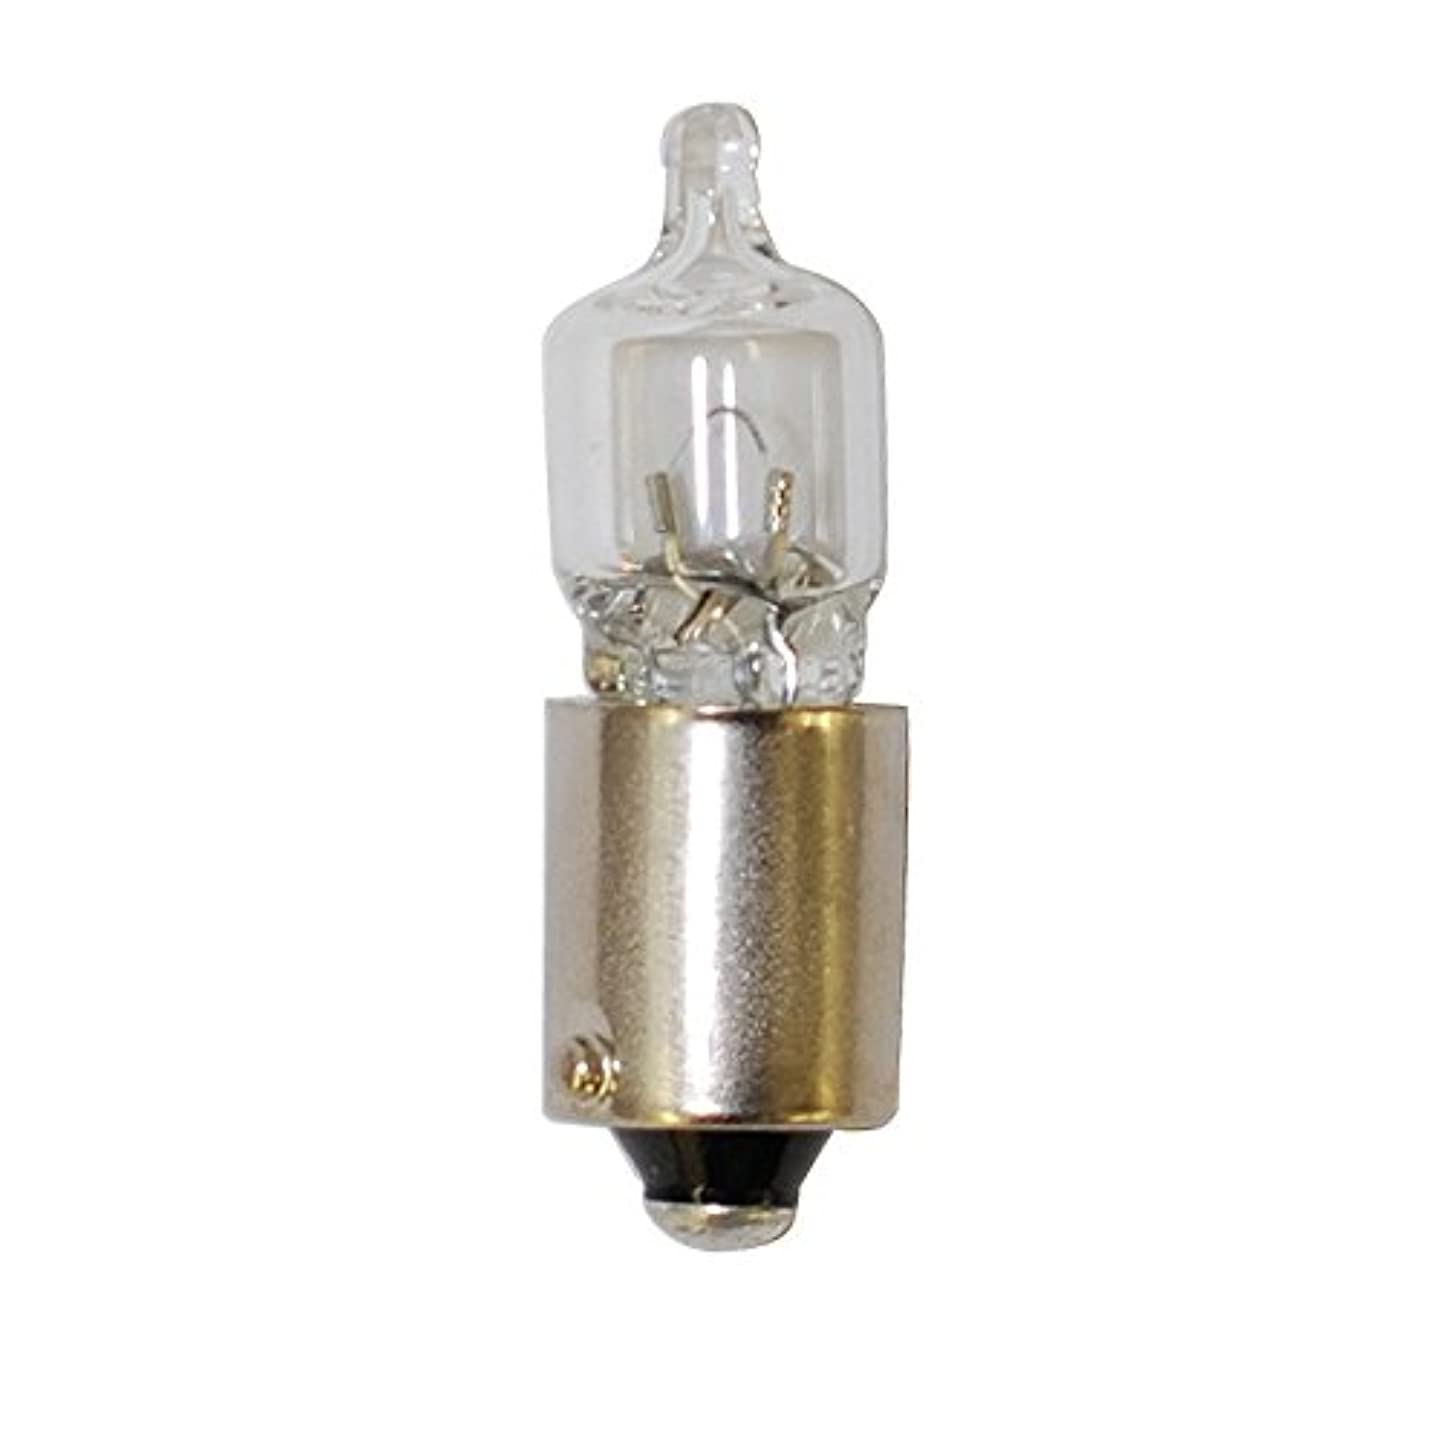 Sylvania 64111 Map Light Bulb